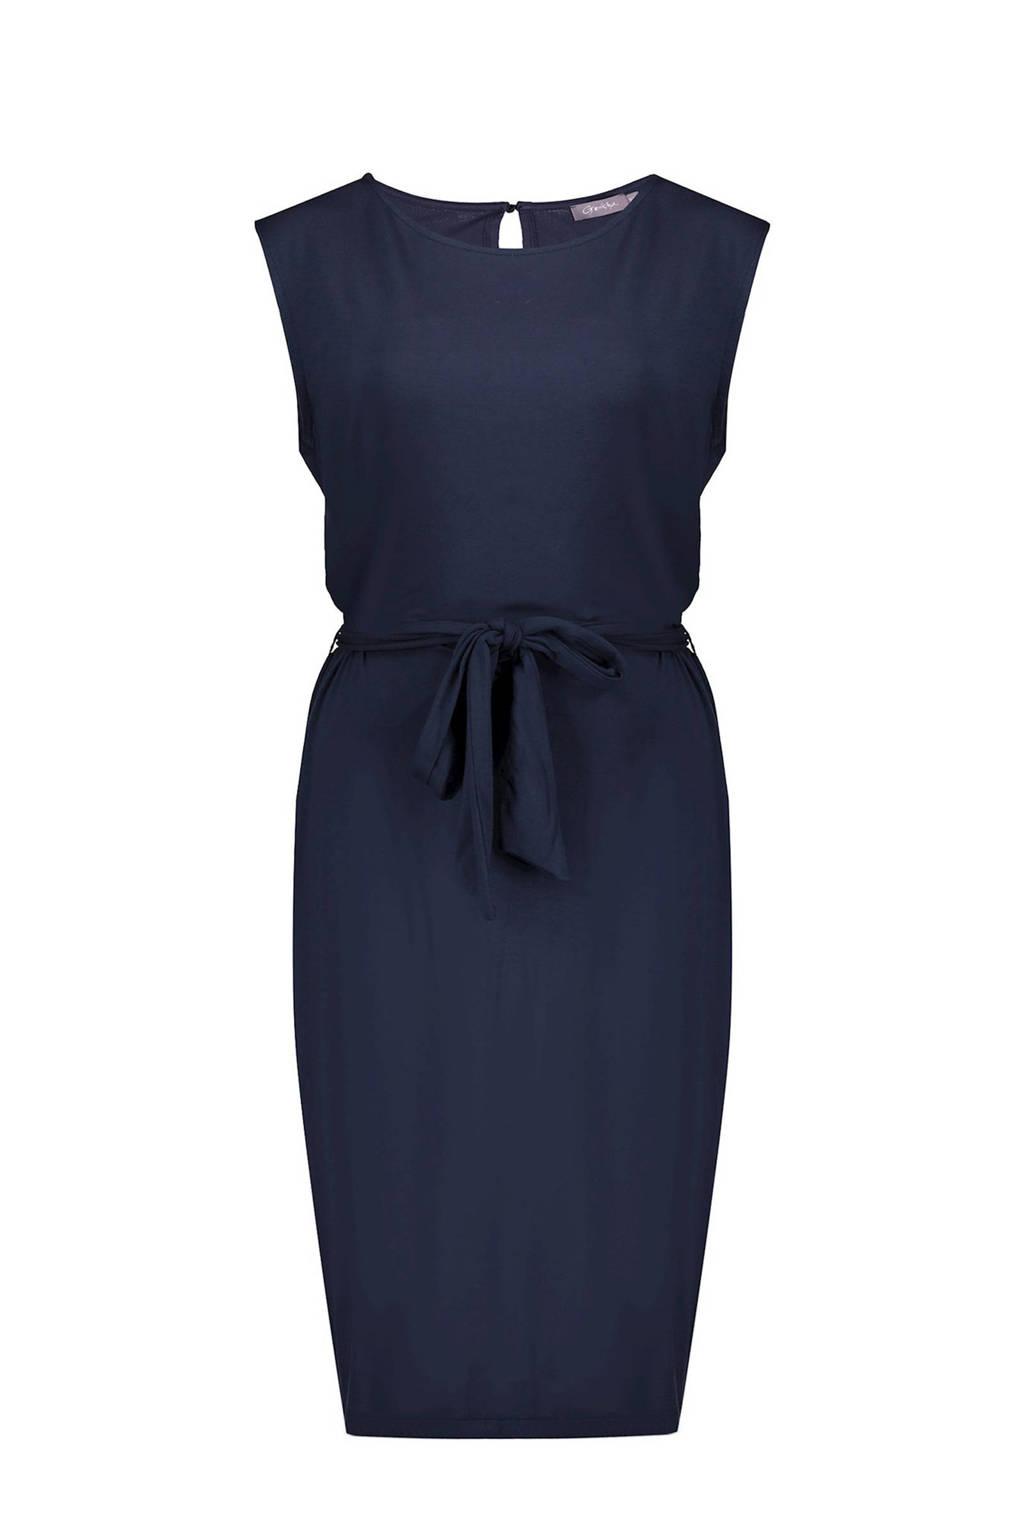 Geisha jurk SOLID met ceintuur blauw, Blauw